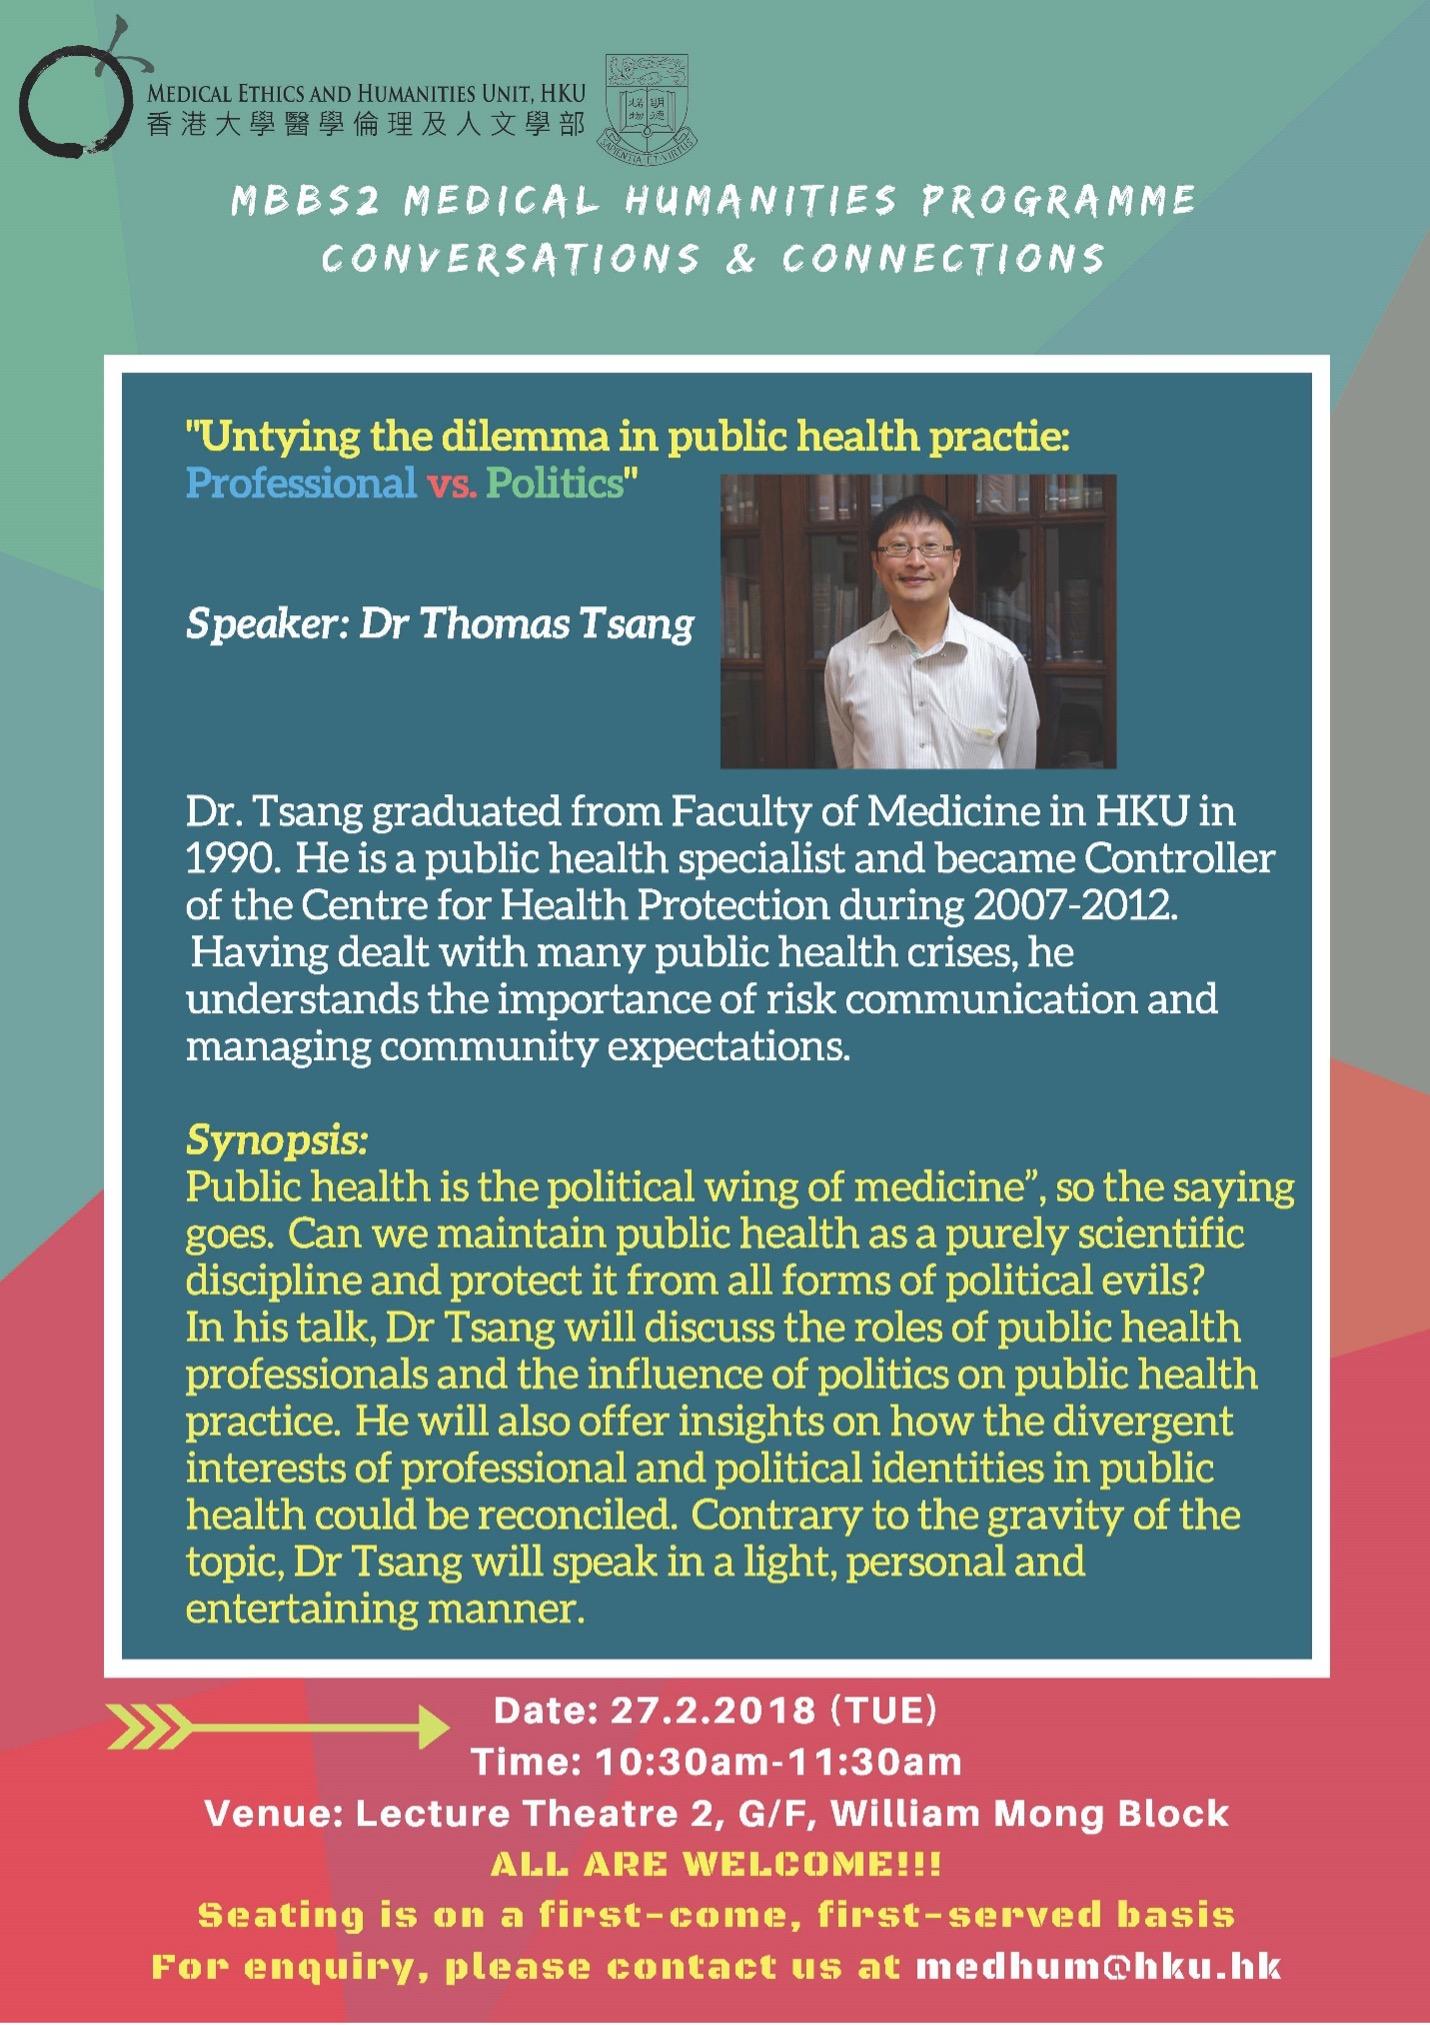 Untying the dilemma in public health practice: Professional vs. Politics